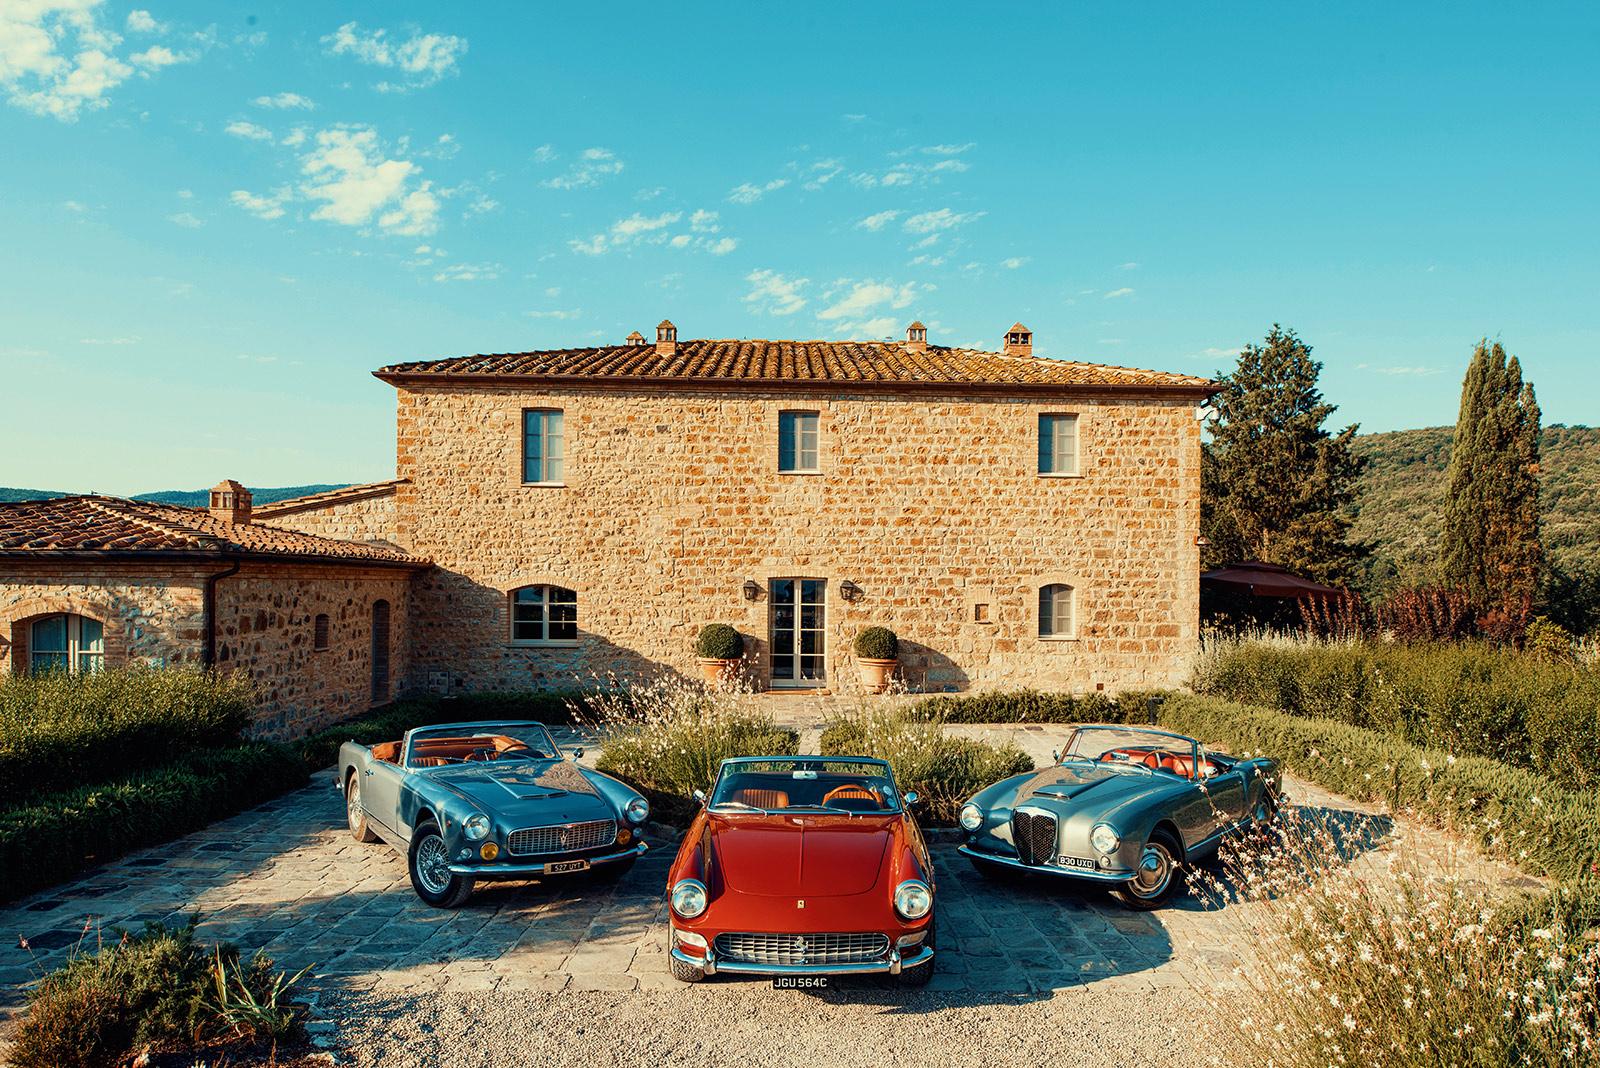 #43, Toscana, Maserati 3500 GT Spyder, Ferrari 275 GTS, Lancia B24S Convertible